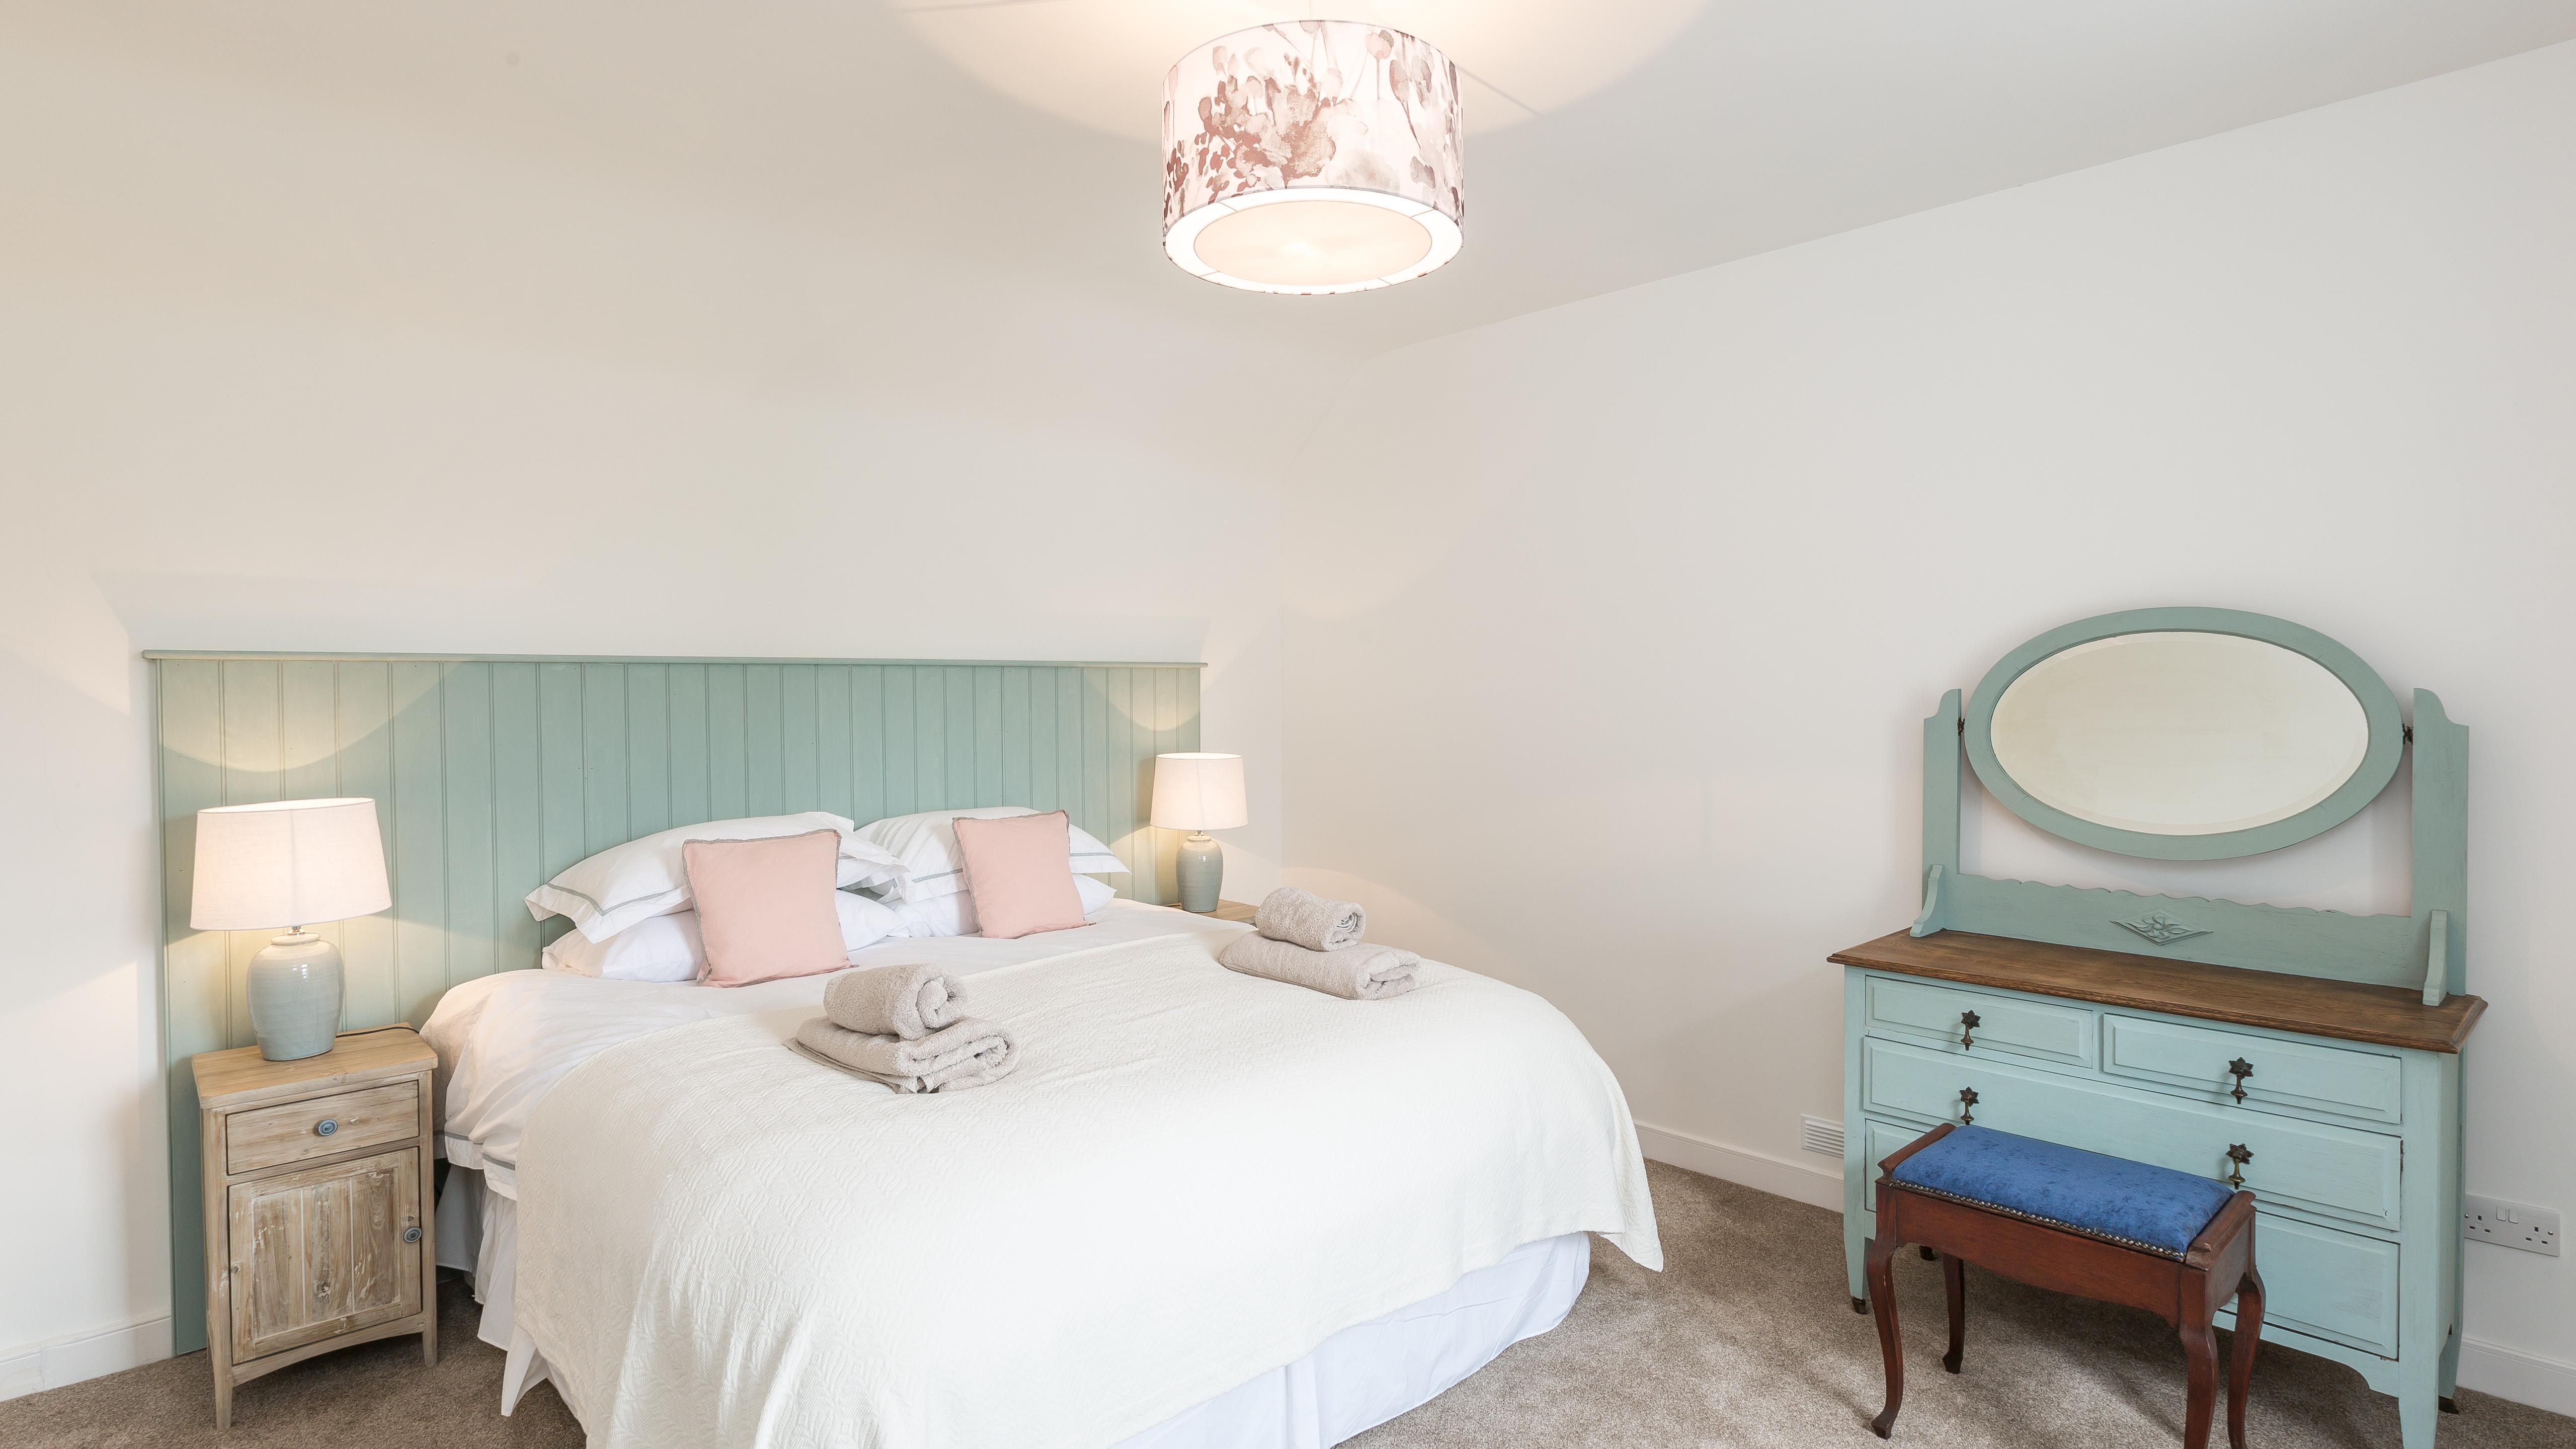 longhill-farmhouse-whithorn-newton-stewart-double-bedroom-2-45